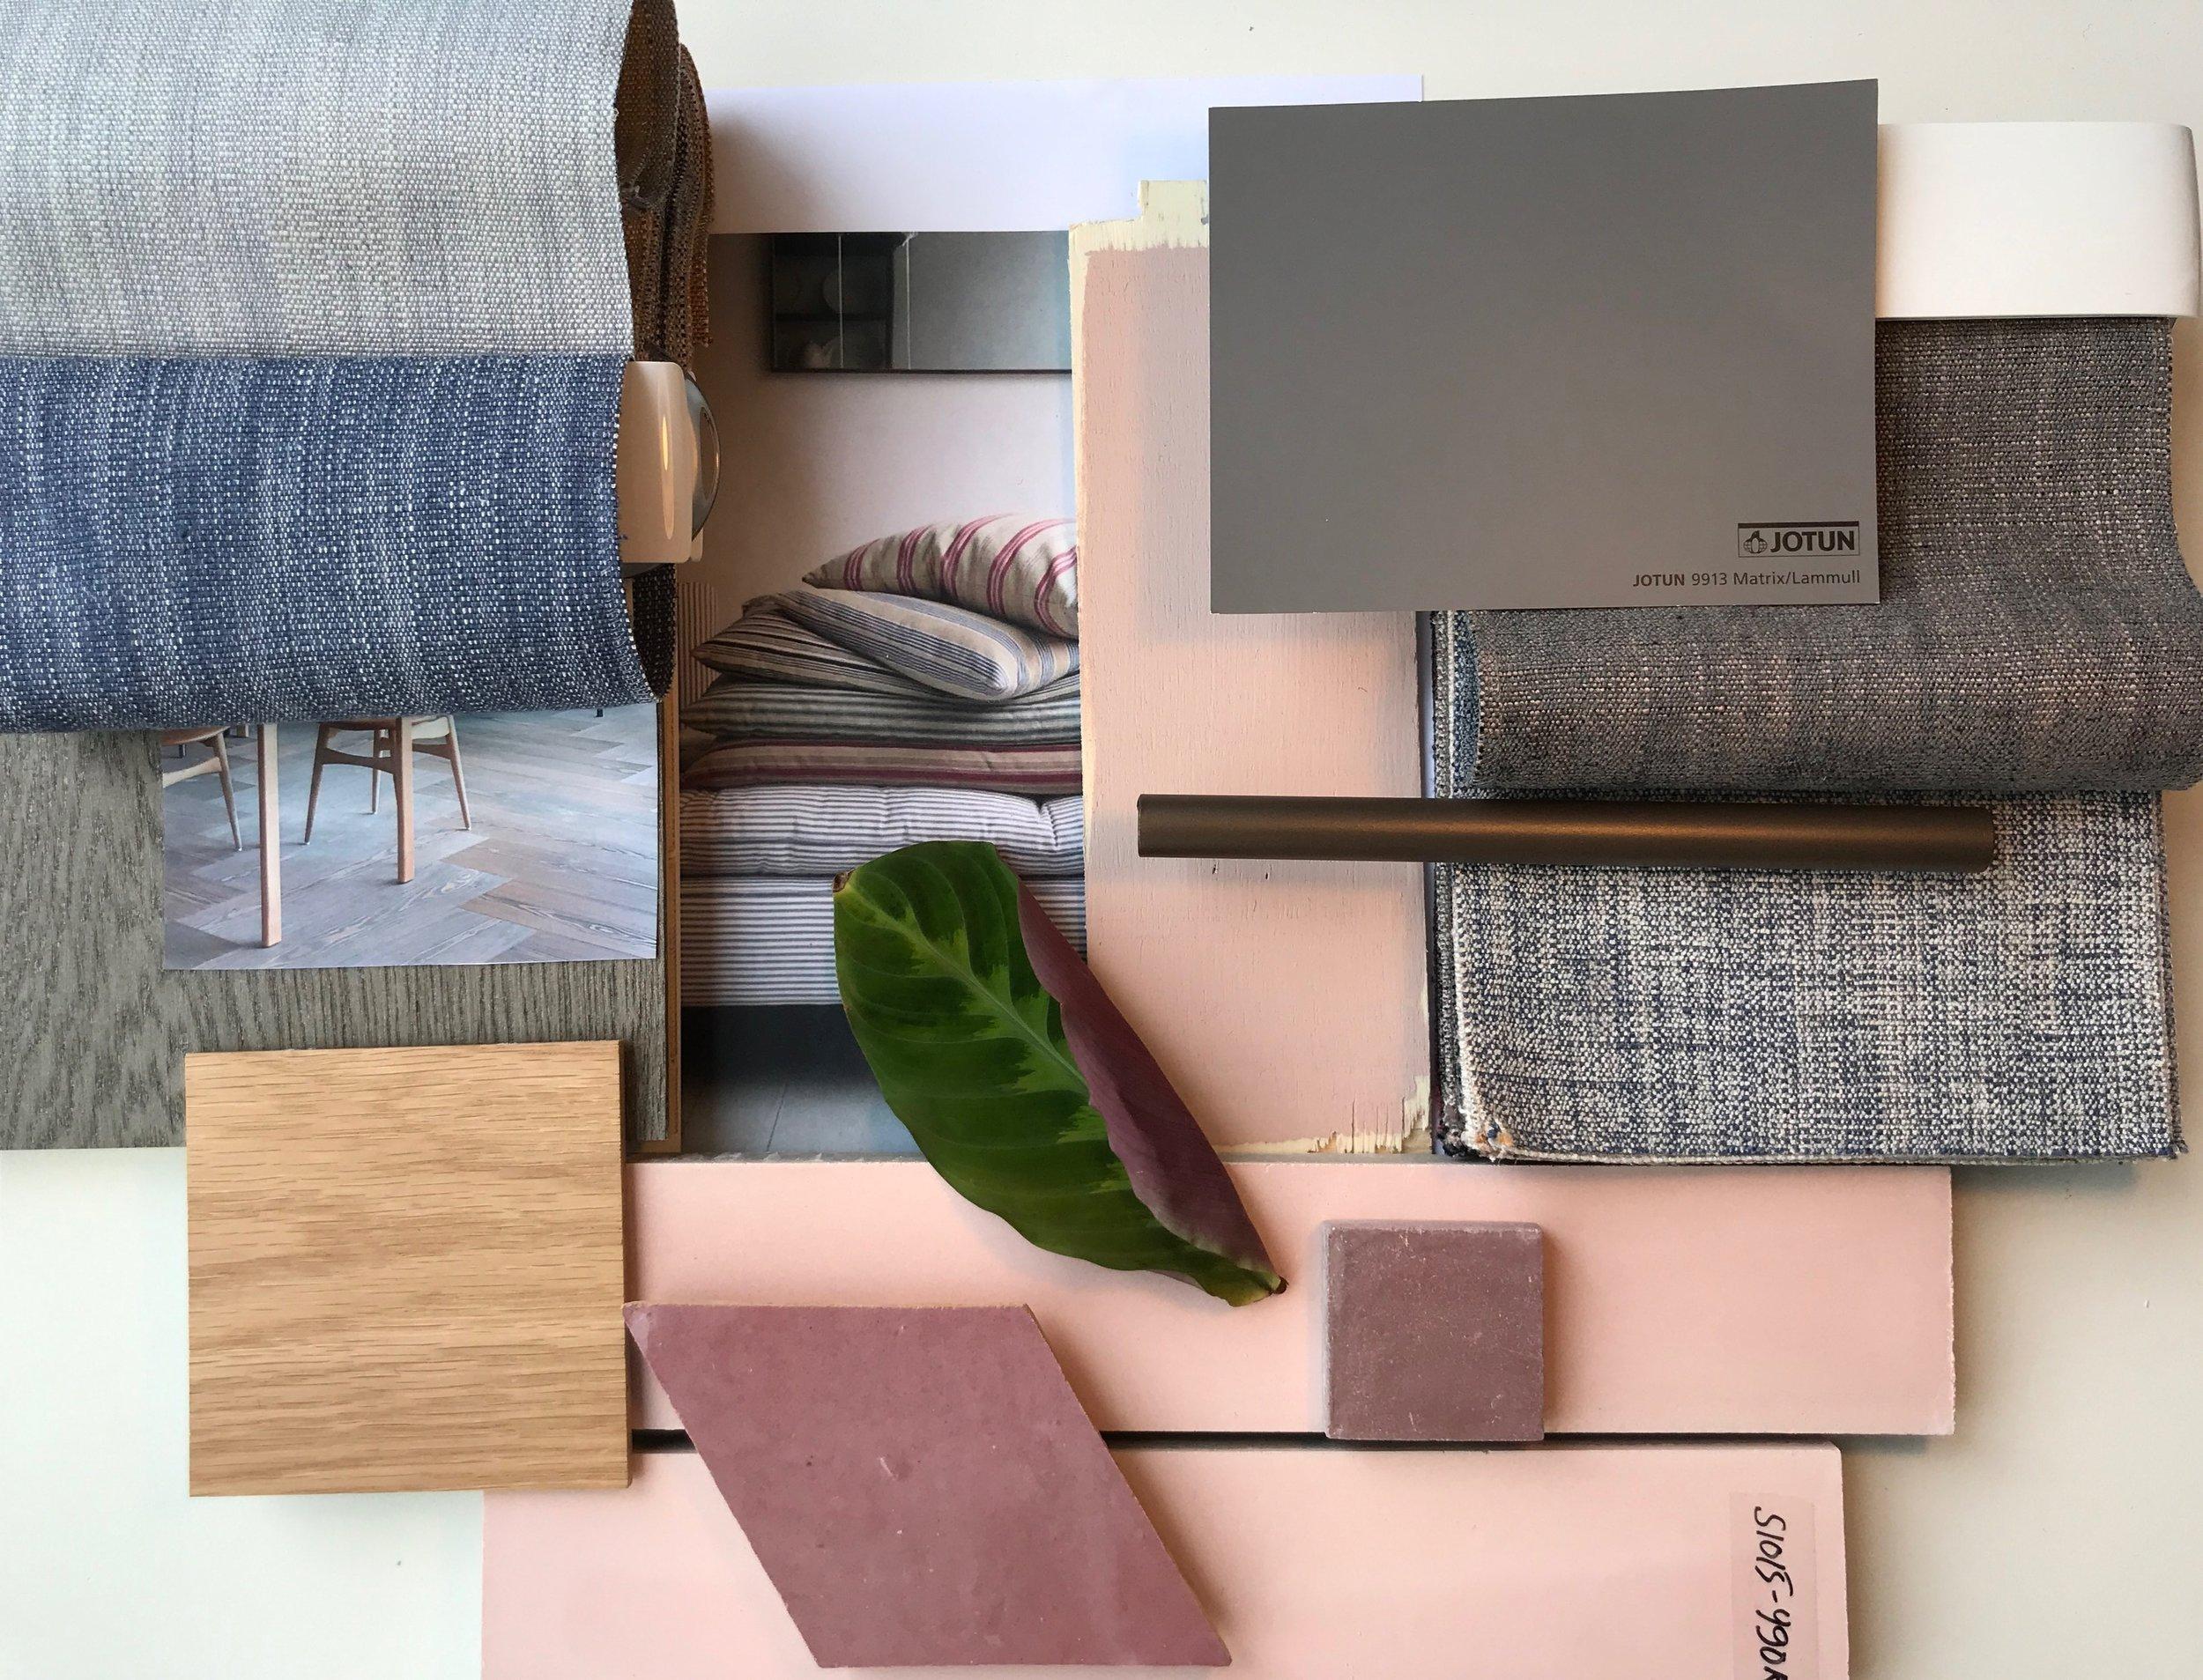 GARDE. Interior design, Color and material palette